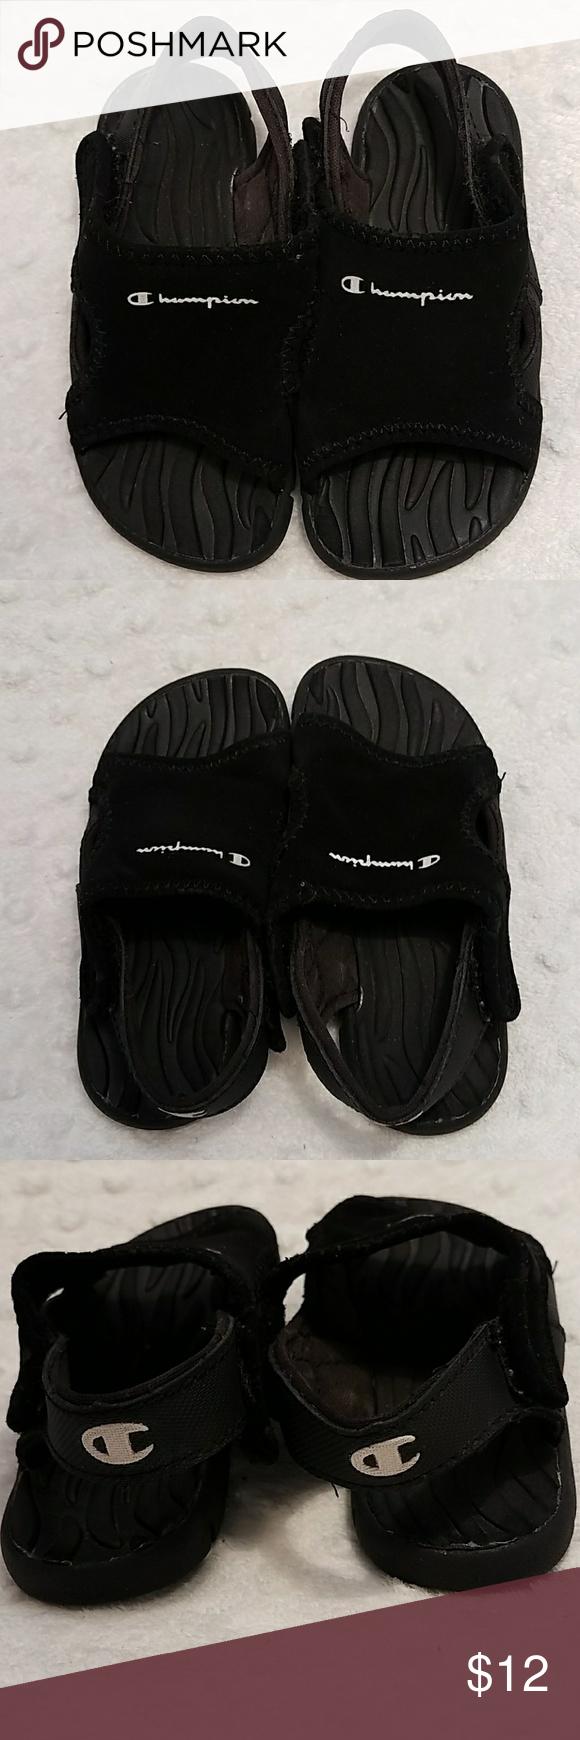 4a88796e4bc91 Champion Boy toddler splash sandals size 7 Champion Boy splash sandals size  7 Black color